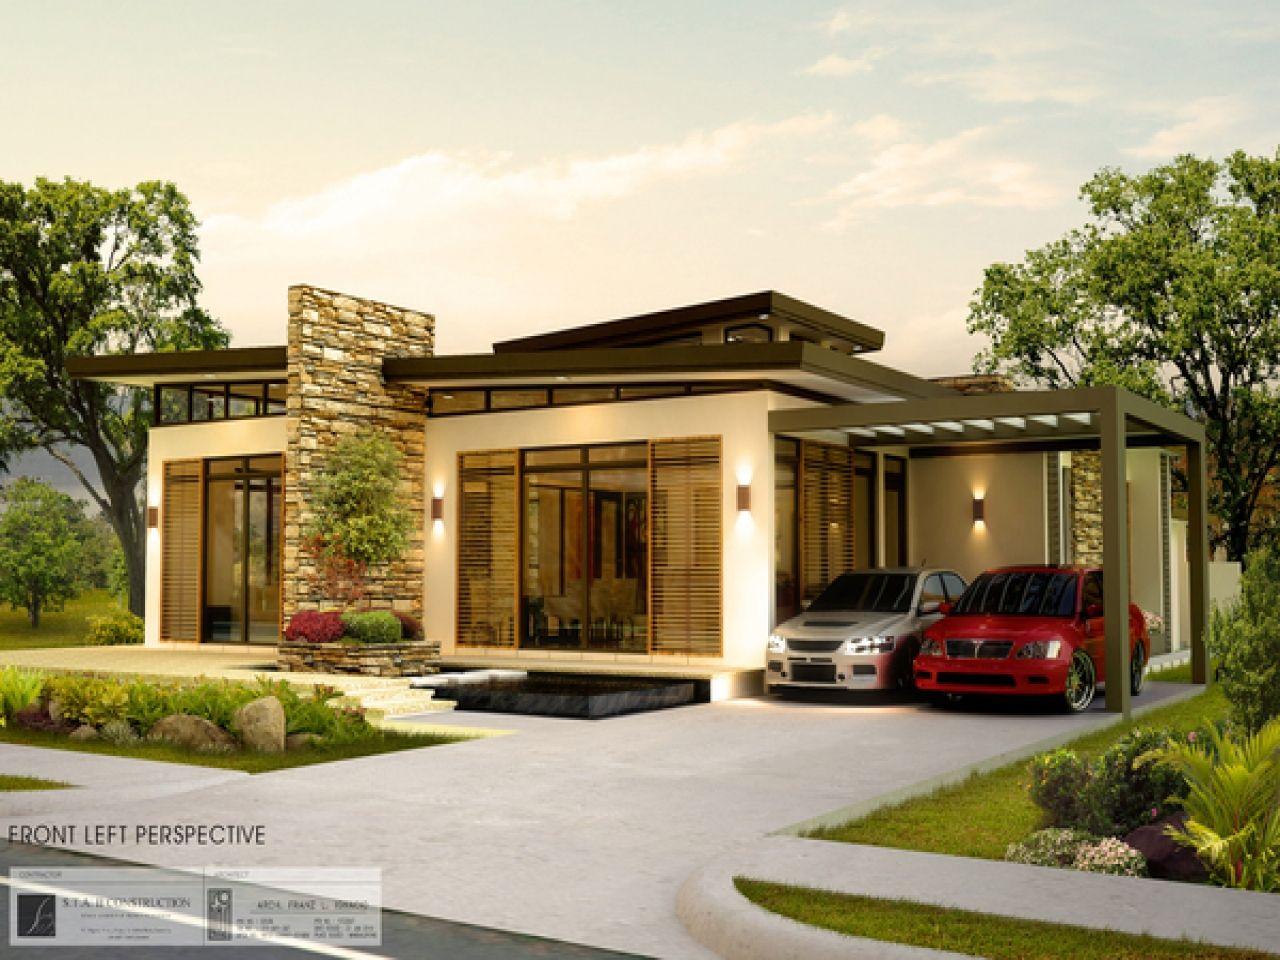 Best Kitchen Gallery: Designs Modern Bungalow House Philippines New Design Forest of Best Home Designs  on rachelxblog.com